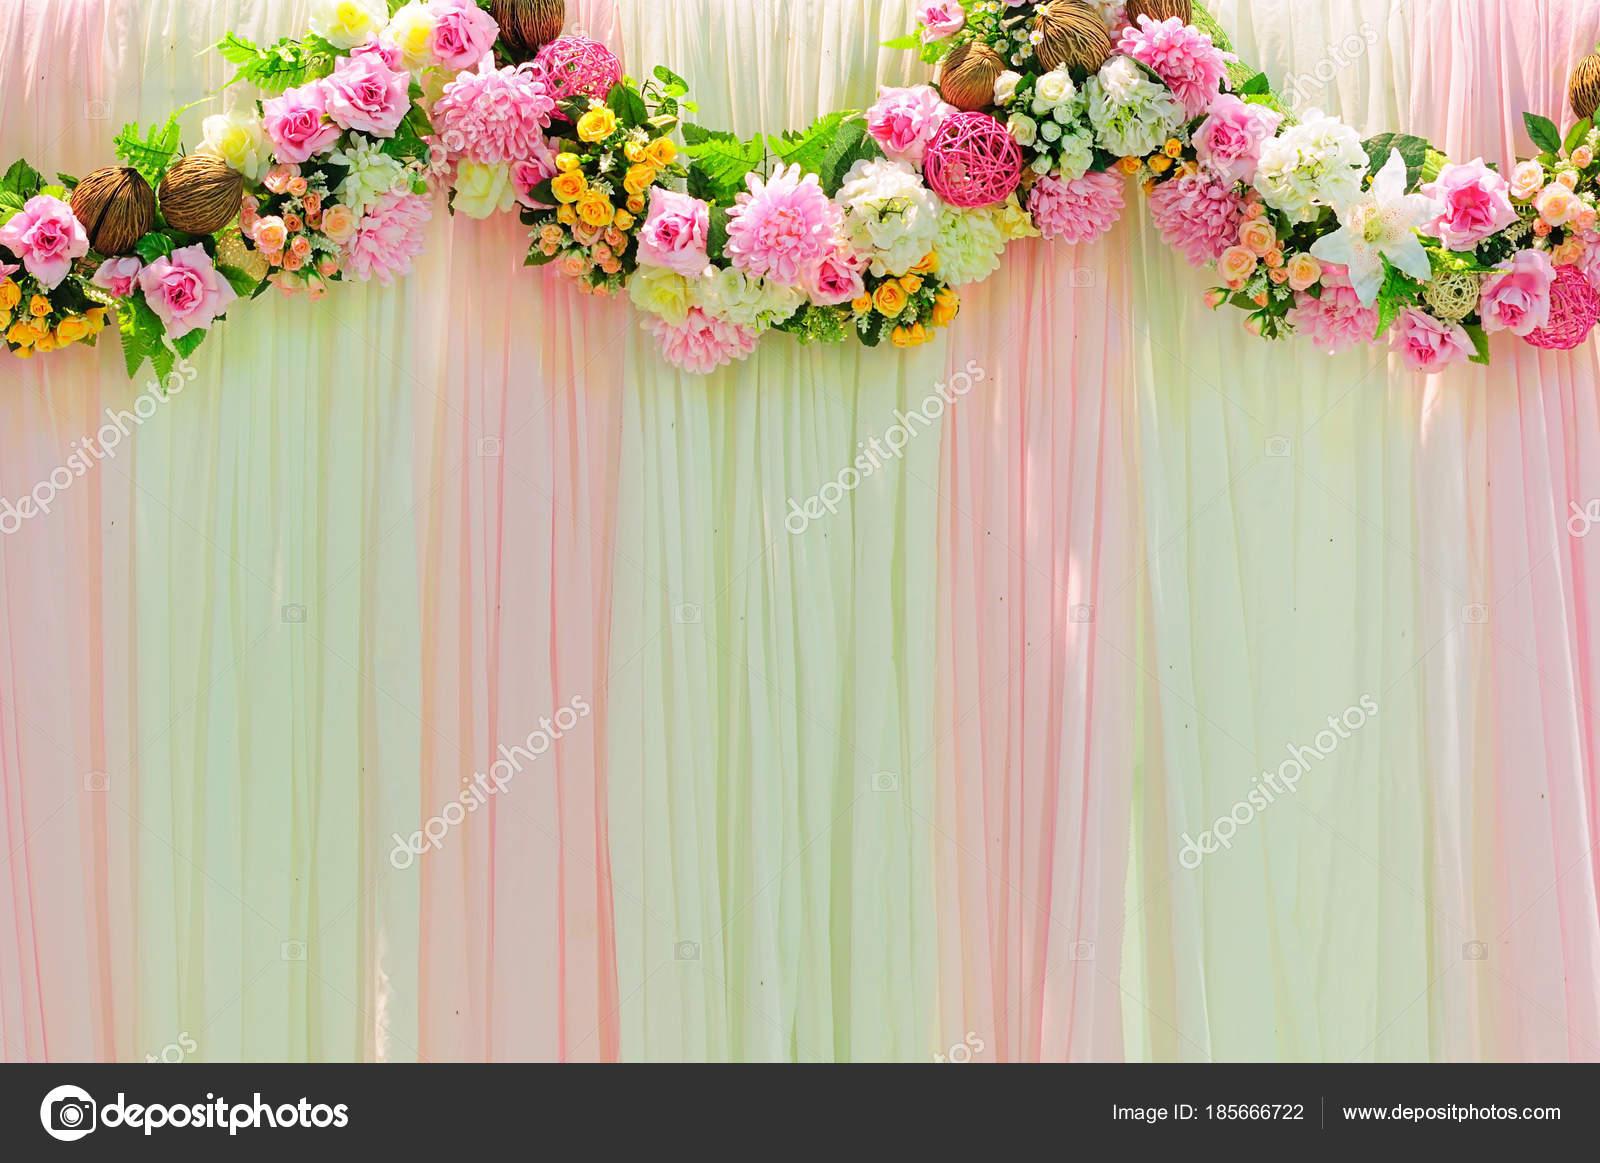 Romance wide scene wedding background decoration 9